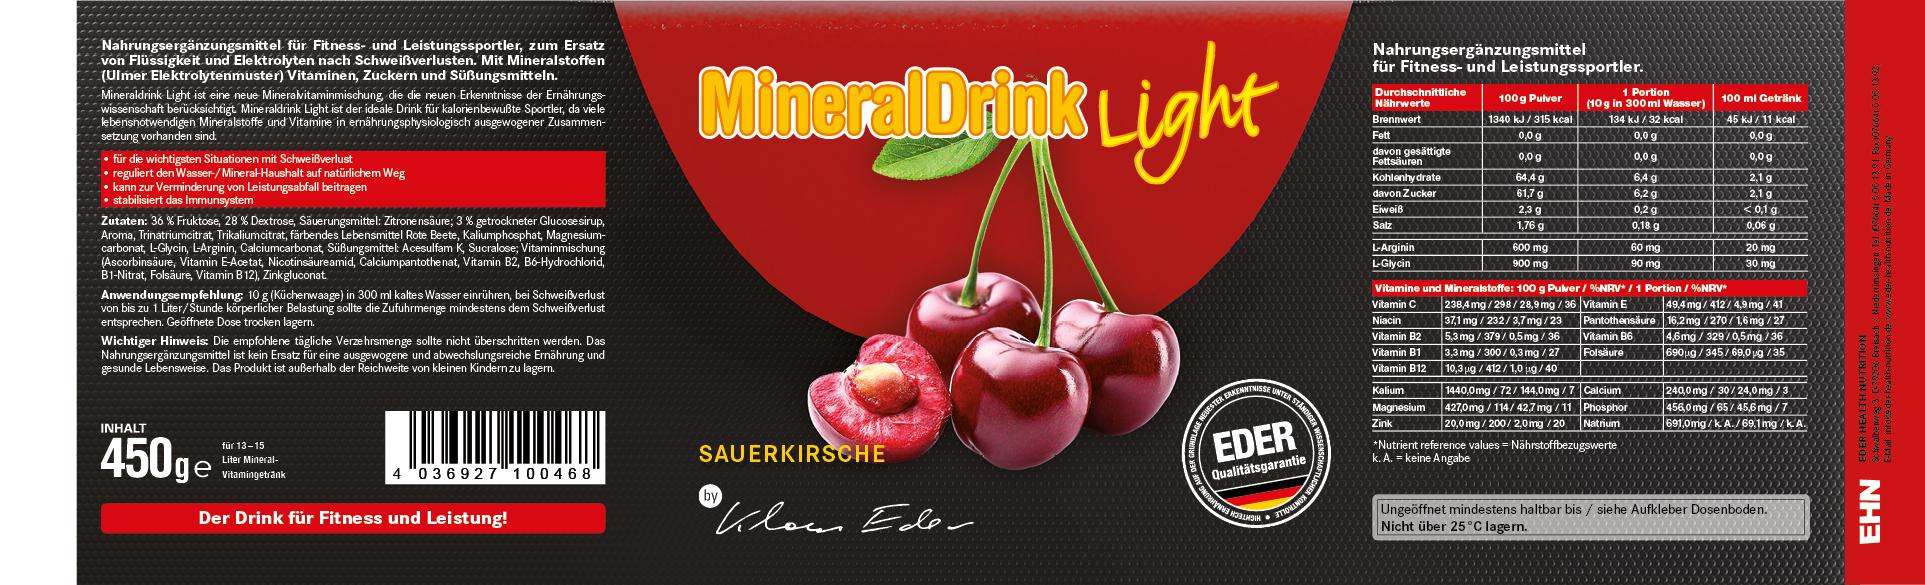 Mineraldrink light - sour cherry